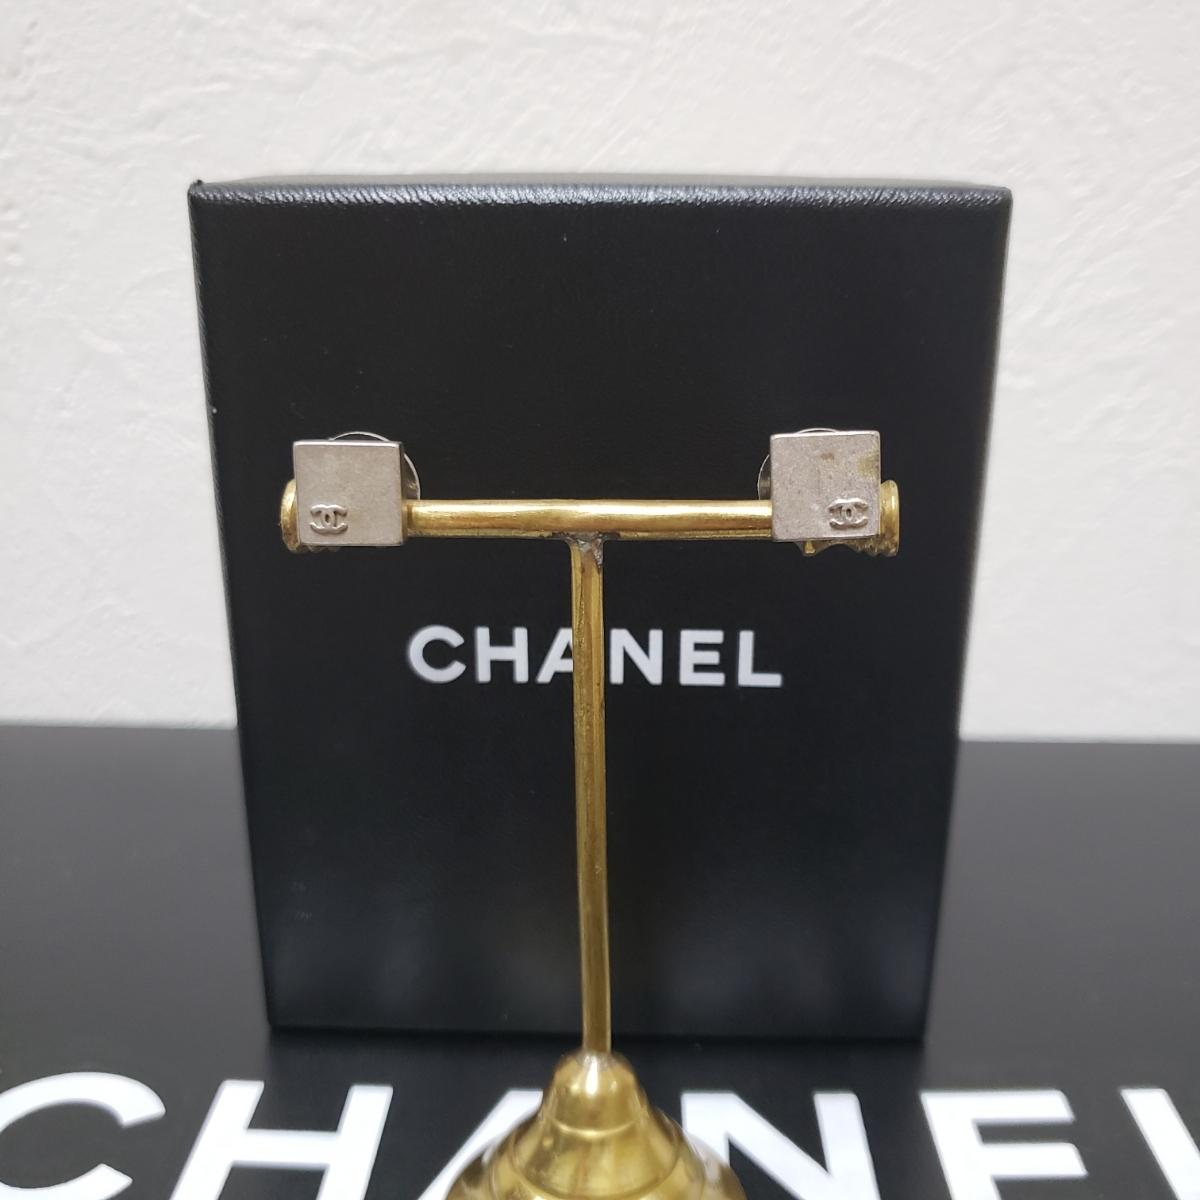 977376f02e83 代購代標第一品牌- 樂淘letao - 確実正規品消毒済みシャネルスクエアピアス